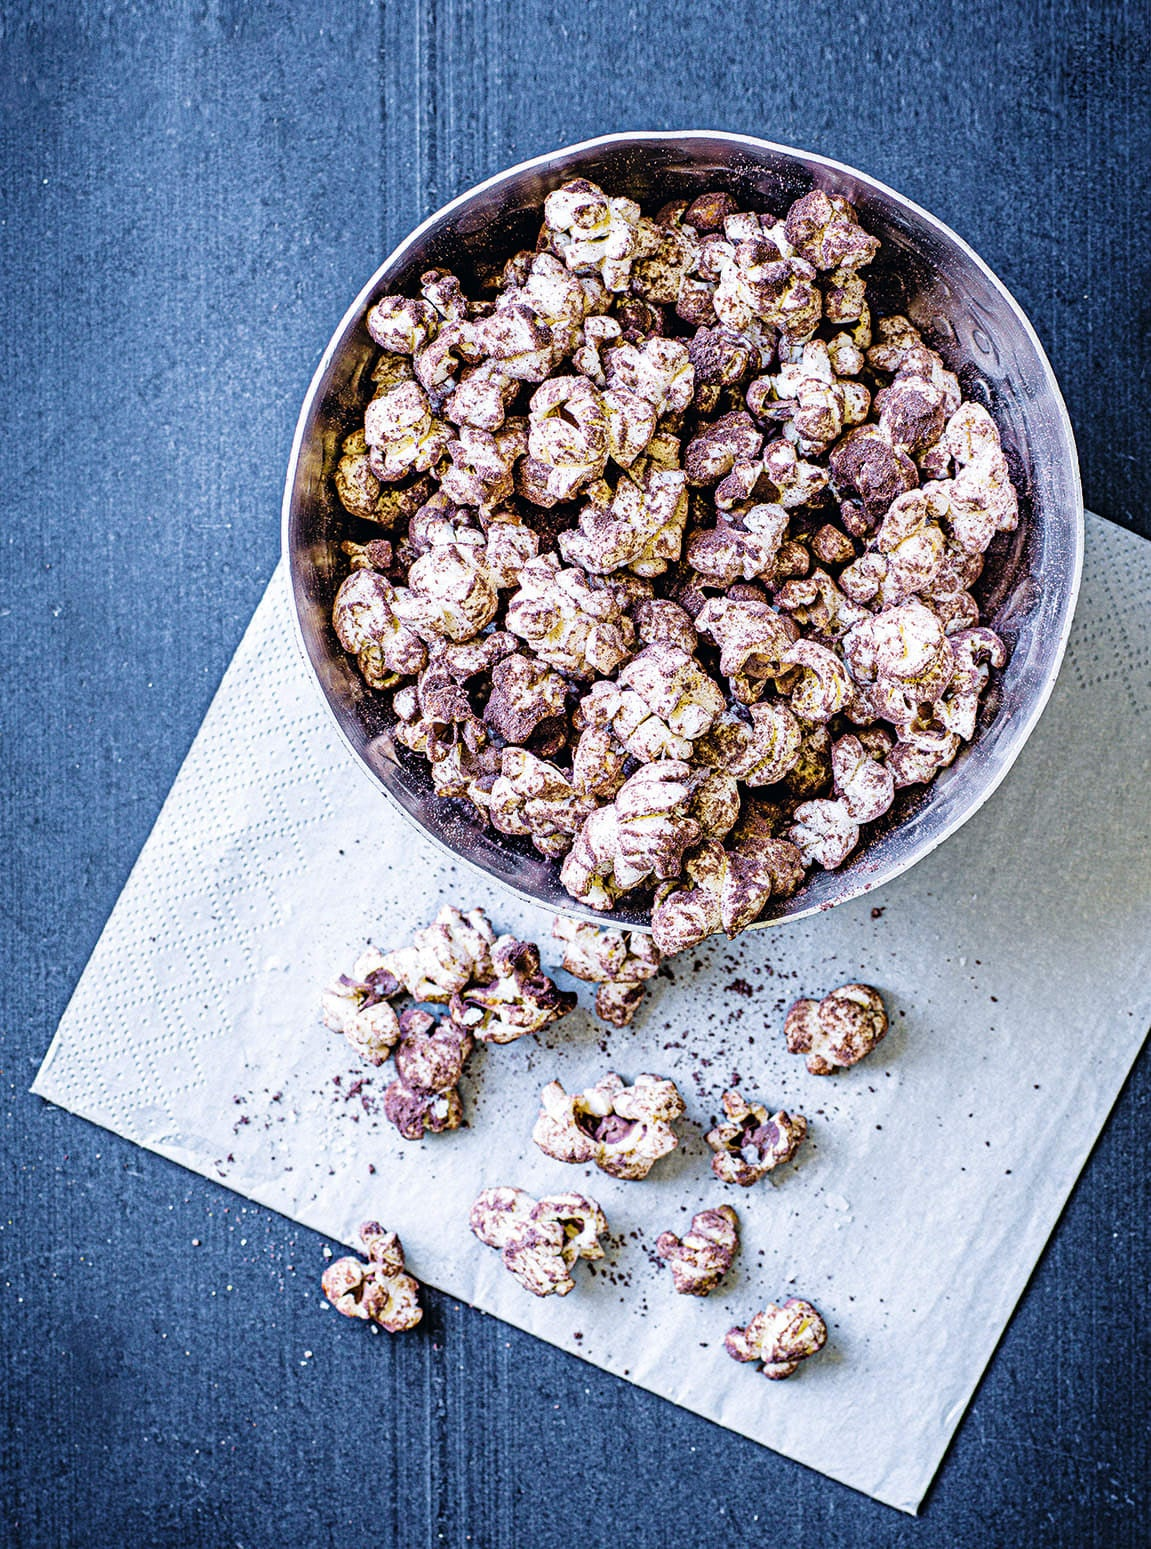 Photo of Salted chocolate popcorn by WW